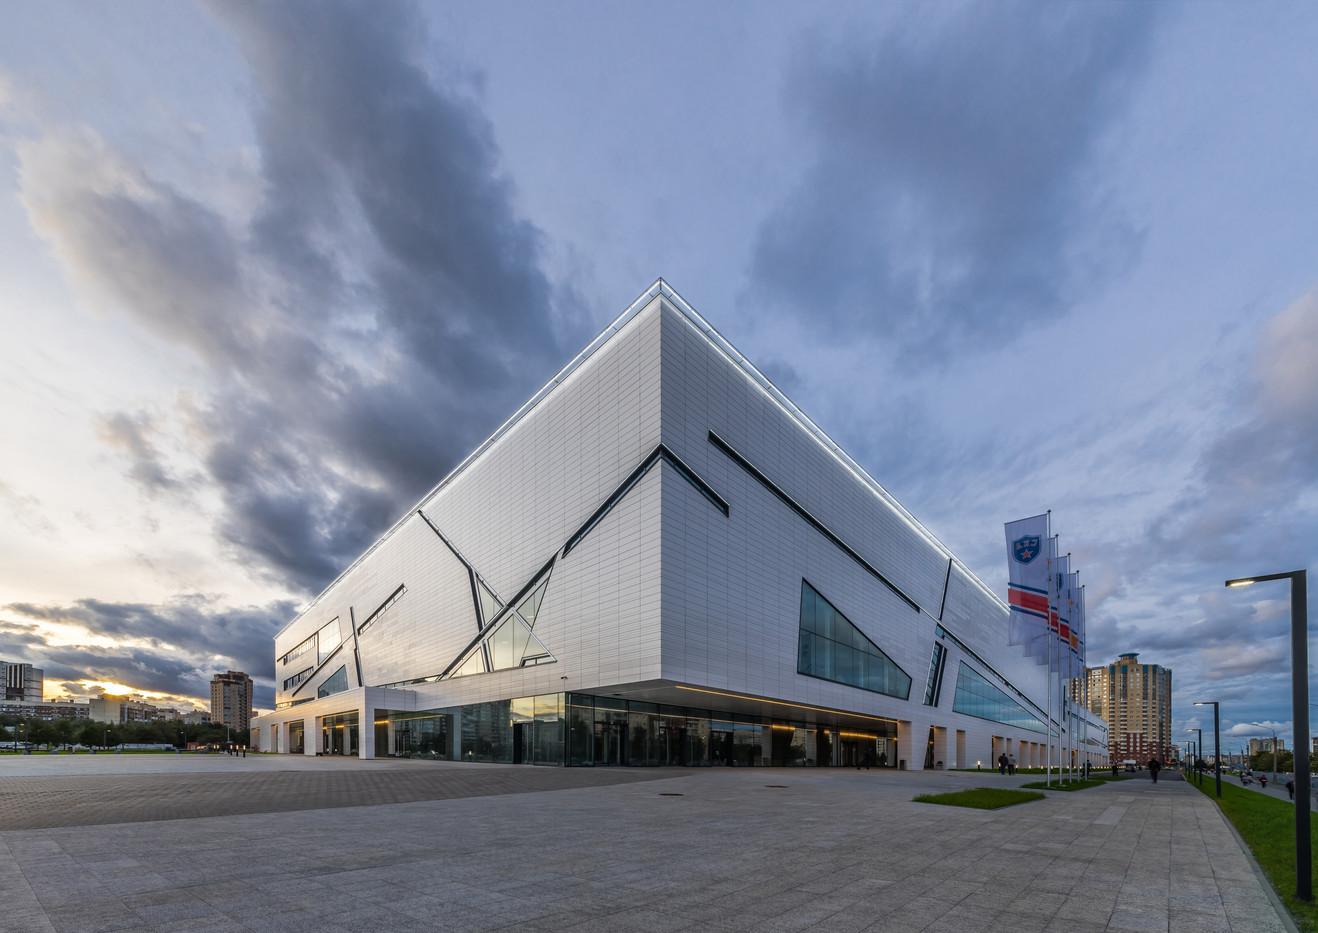 Hockey Arena of club SKA. St. Petersburg. Russian Avenue. 2017. Хоккейная арена клуба СКА. Санкт-Петербург. Российский проспект. 2017.